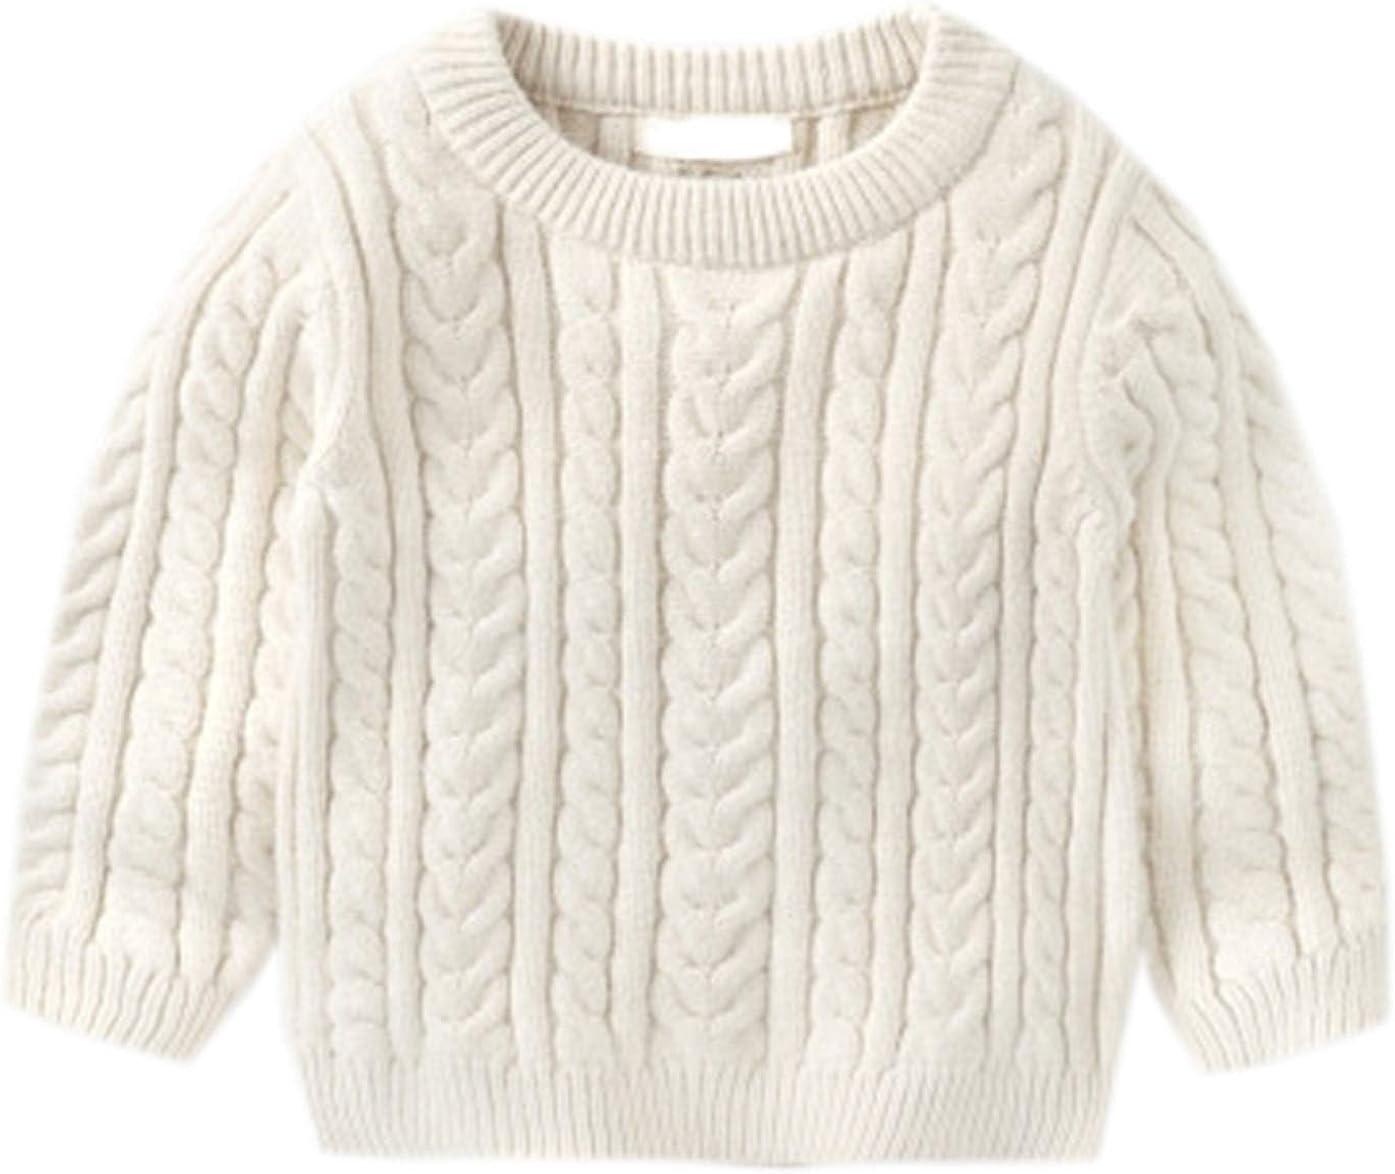 Ameyda Boys' Crewneck Cable Knit Sweater